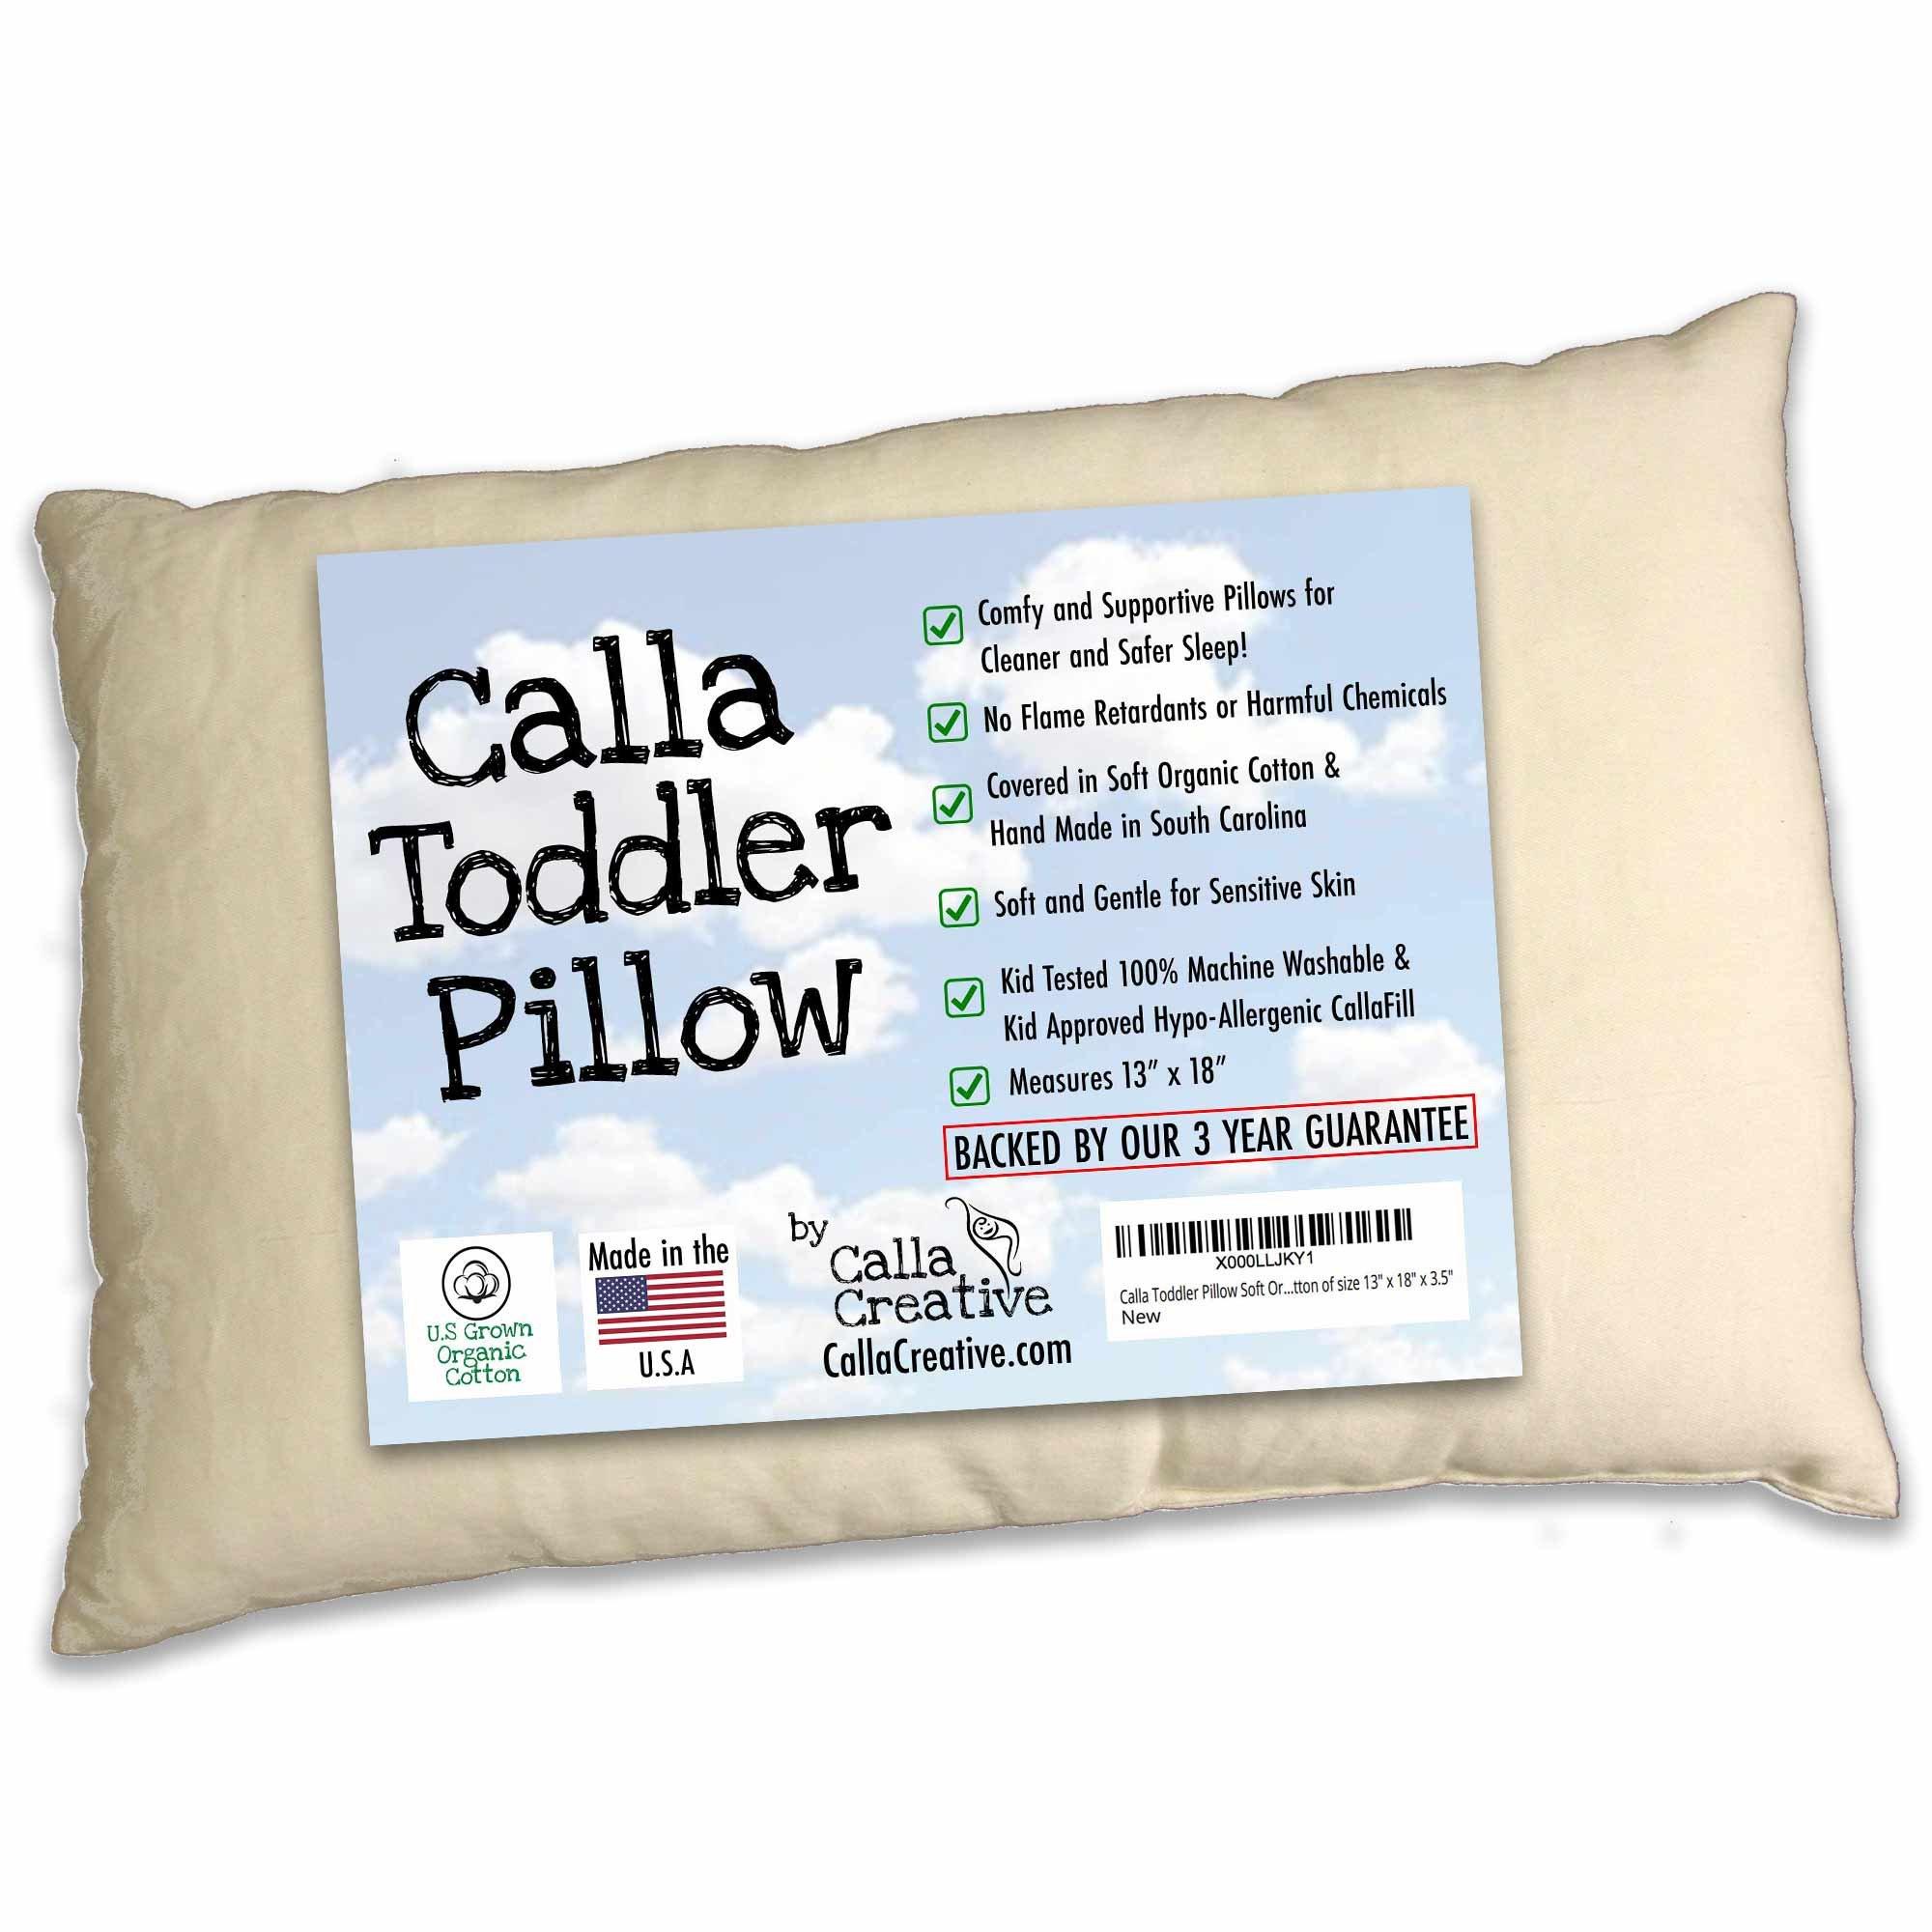 Calla Toddler Pillow Soft Organic Cotton of size 13'' x 18'' x 3.5'' by Calla Creative (Image #1)